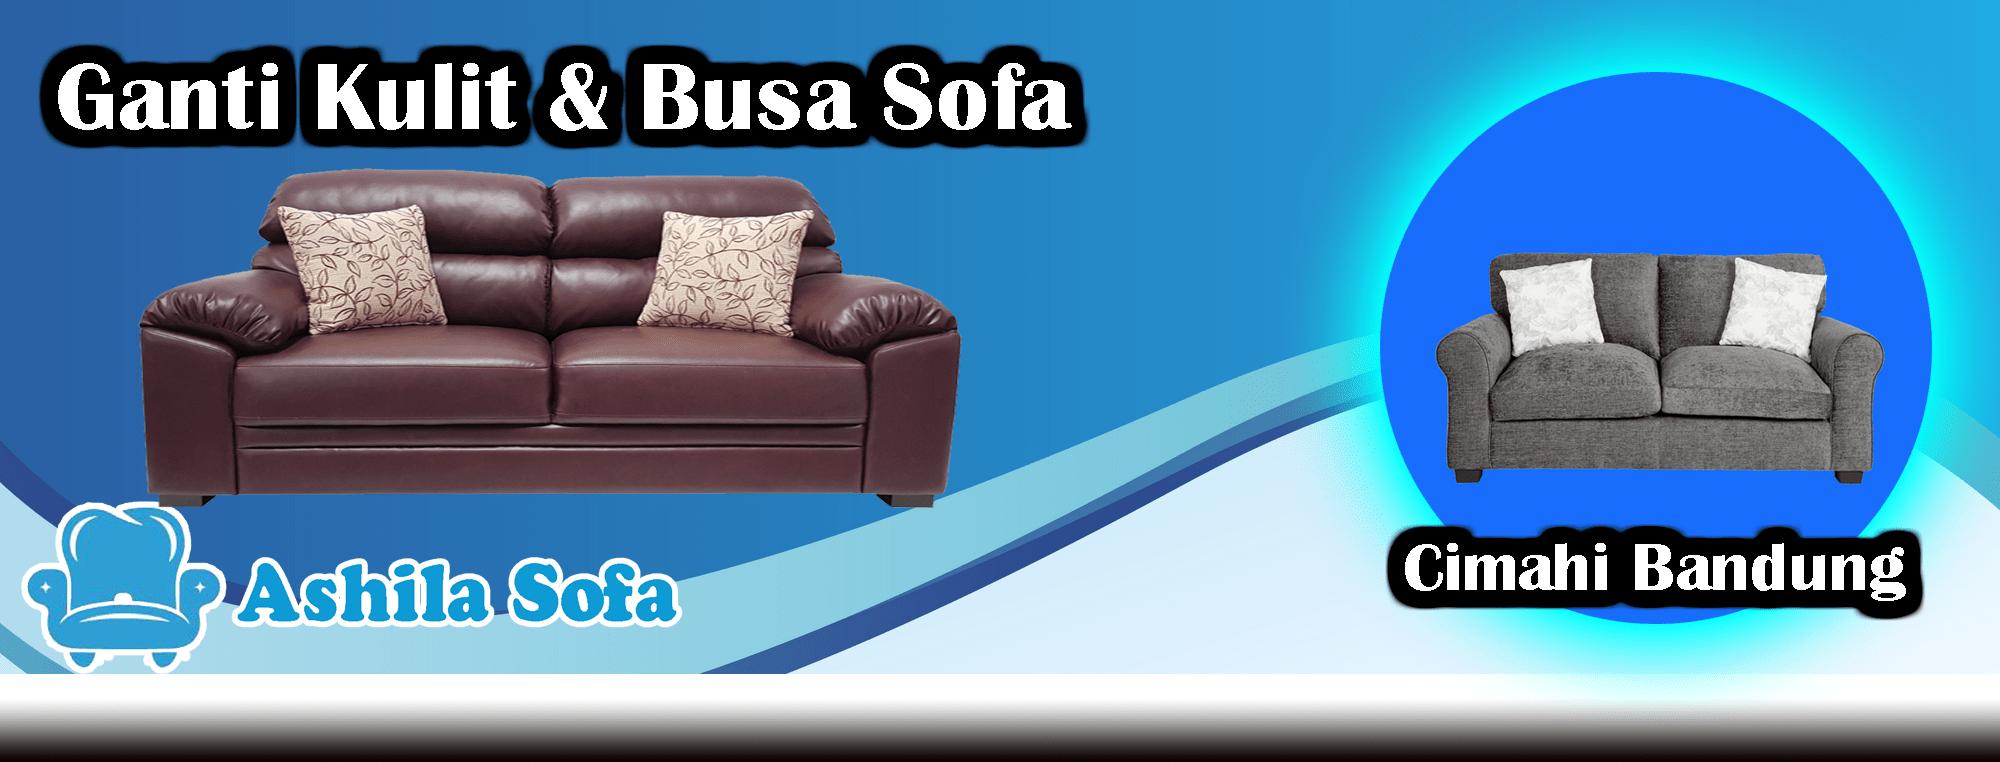 Ganti Kulit & Busa Sofa Di Cimahi Bandung